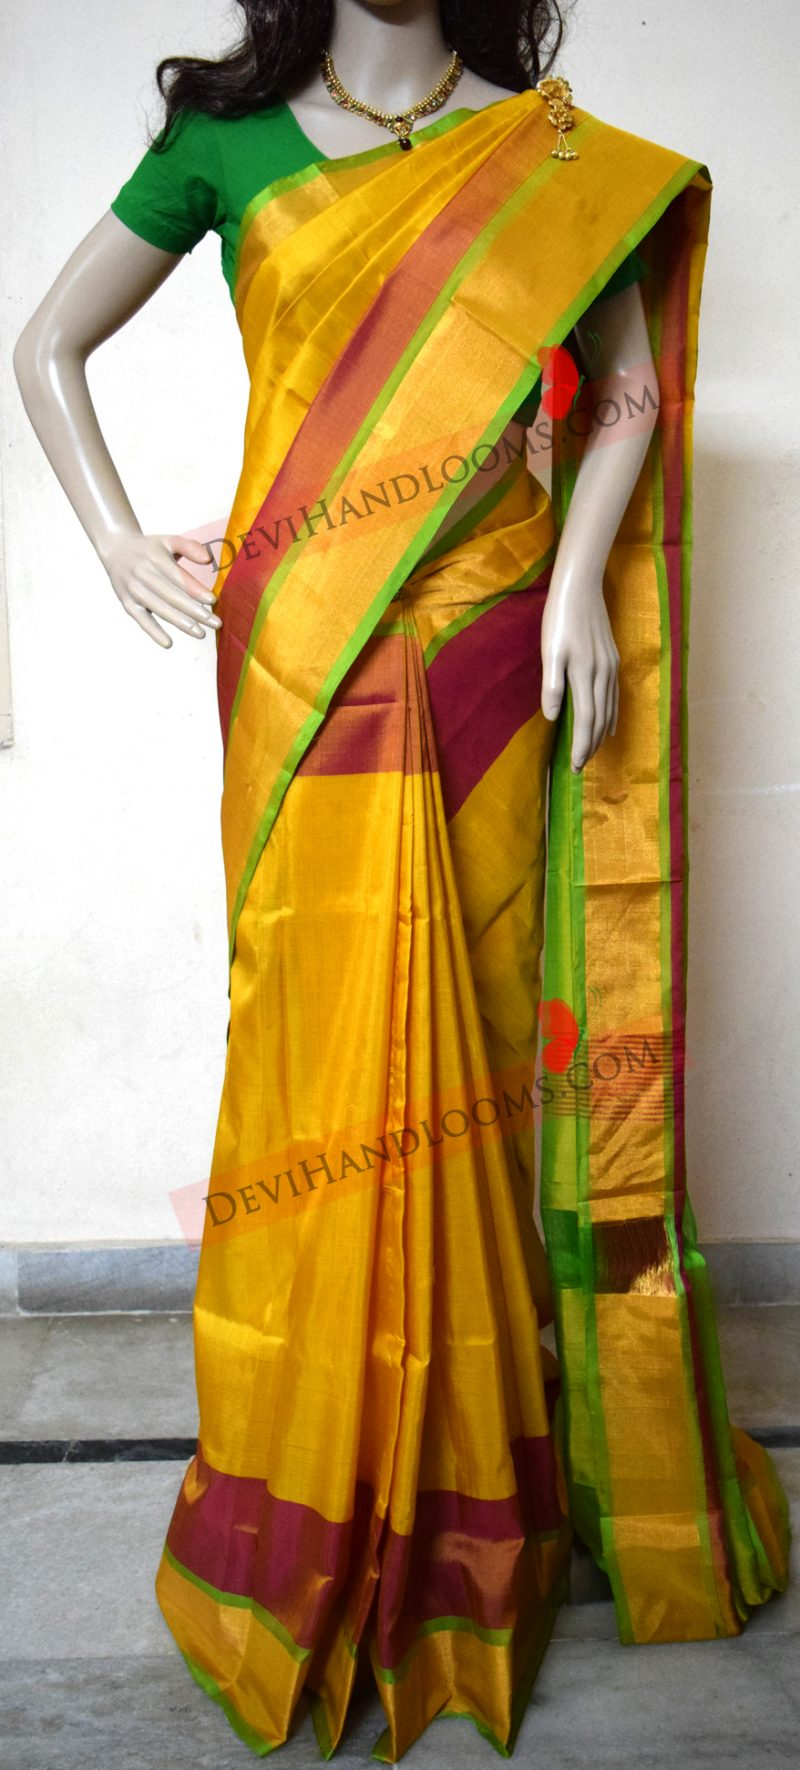 mustard-yellow-uppada-pure-silk-saree-front-view